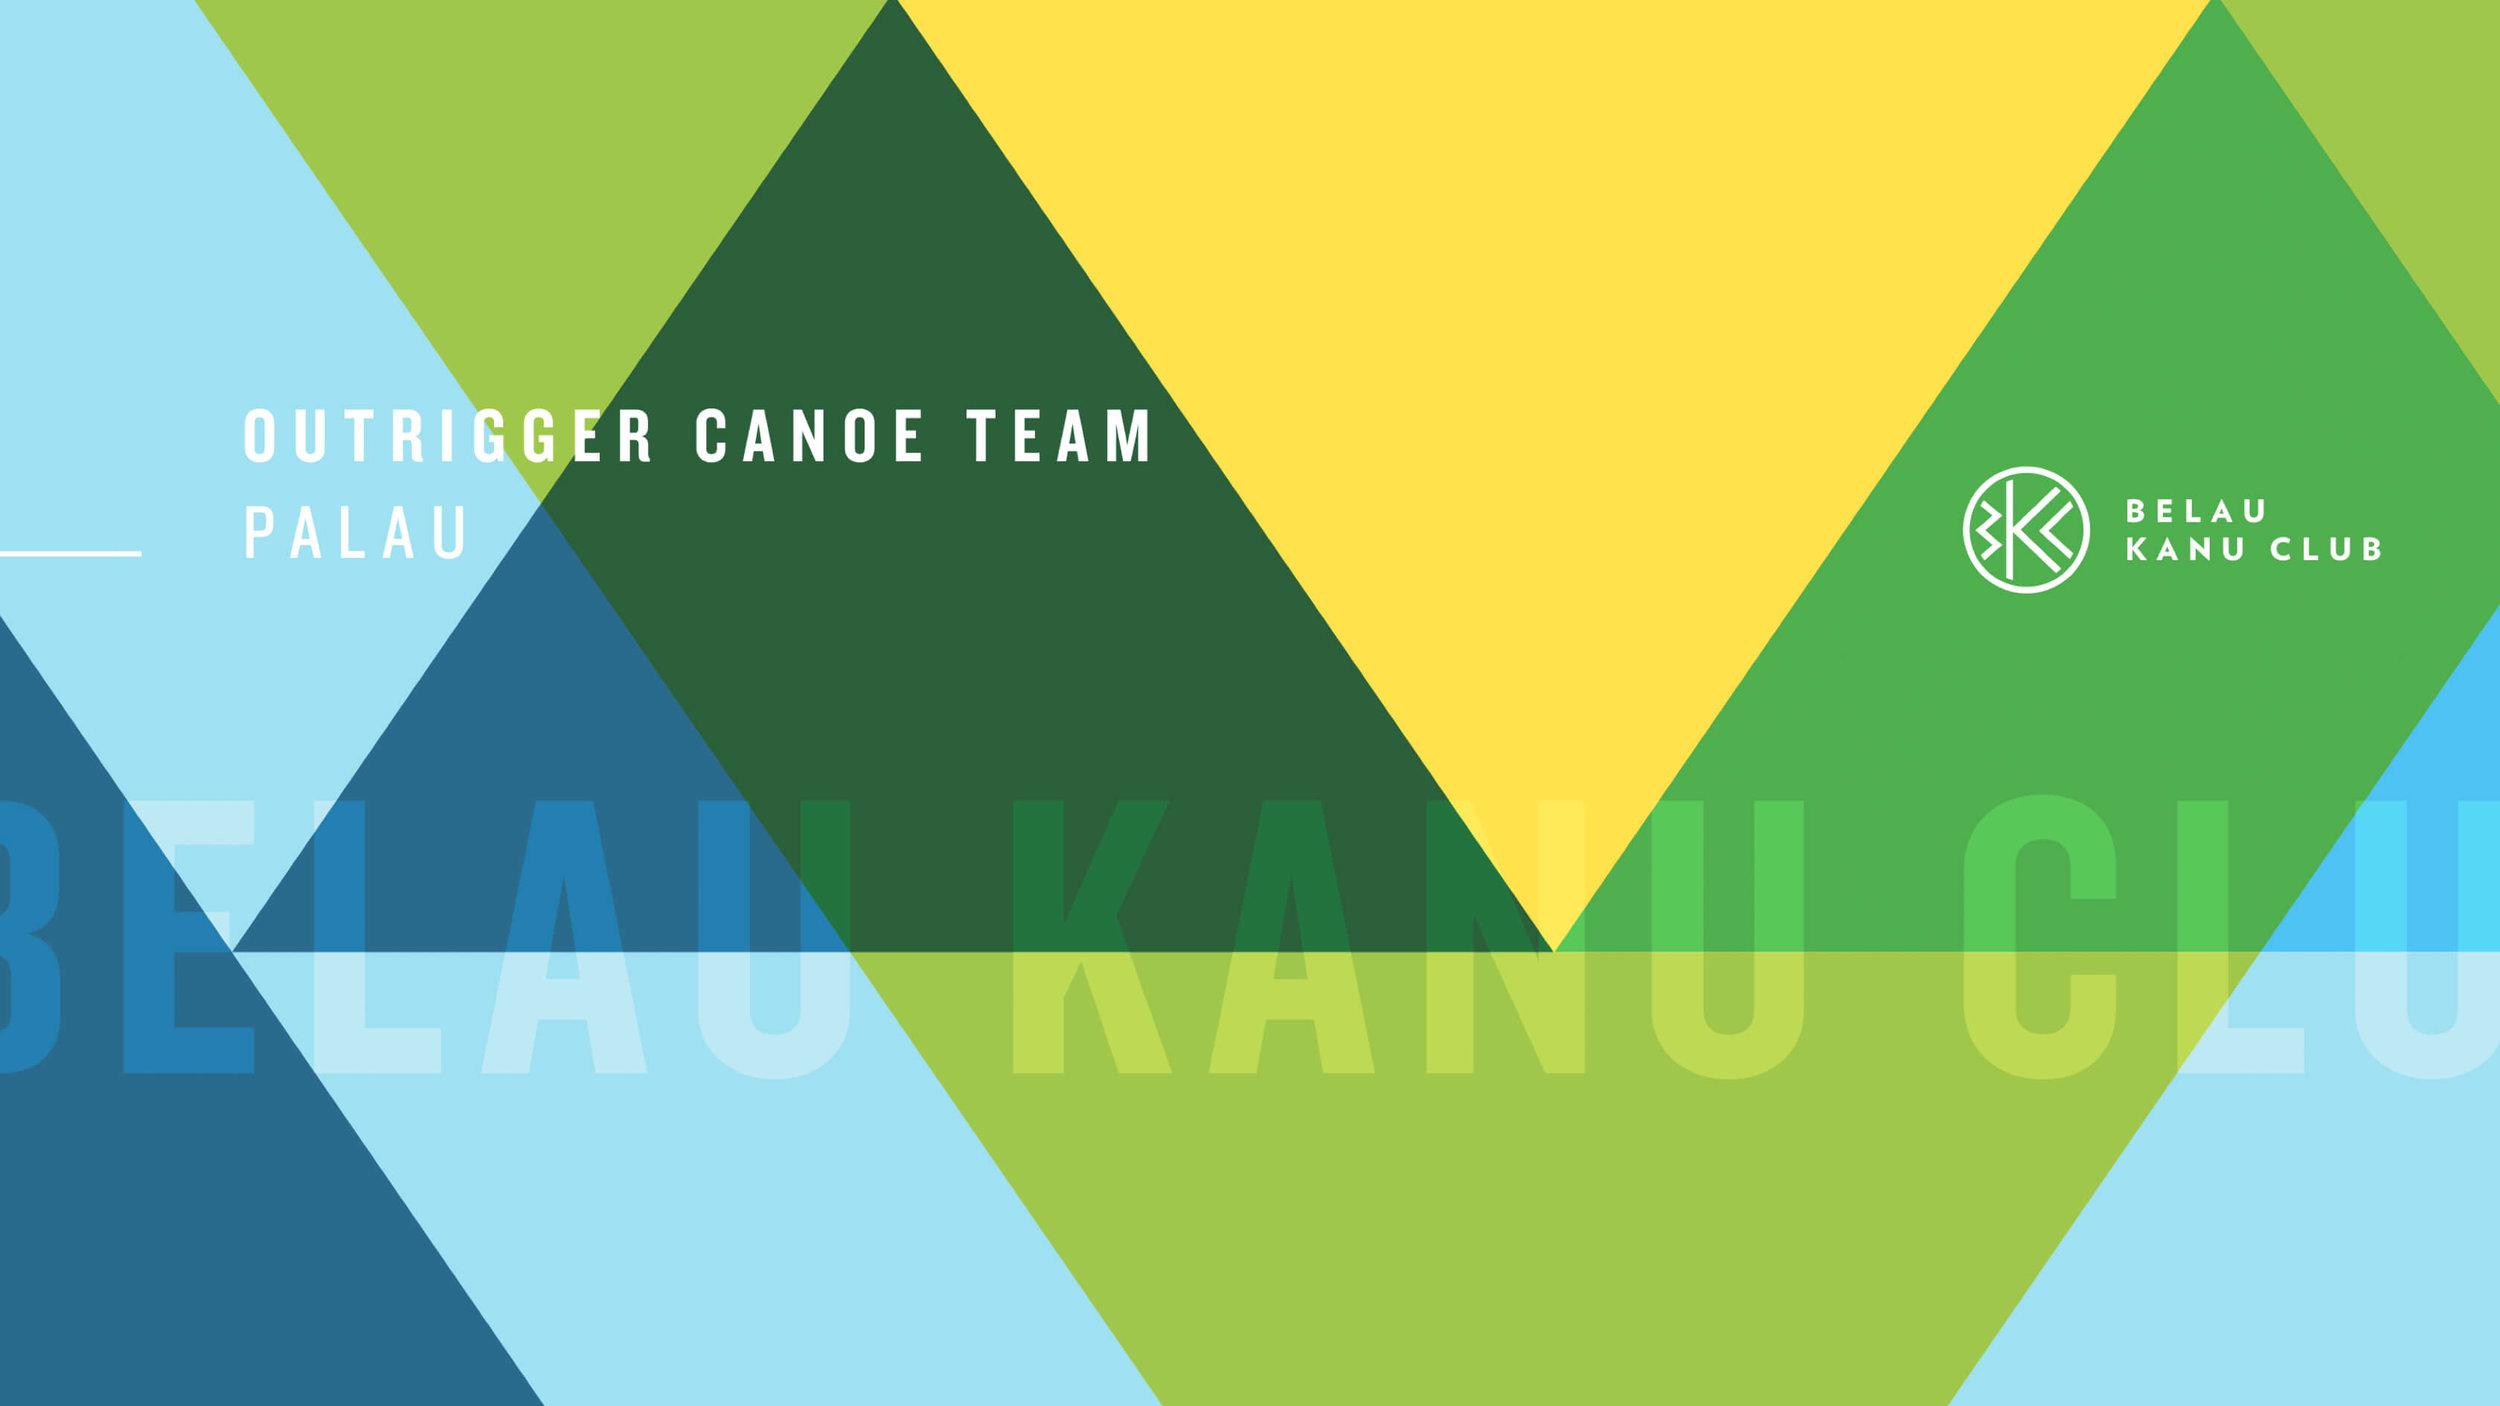 Belau Kanu Club outrigger canoe brand system